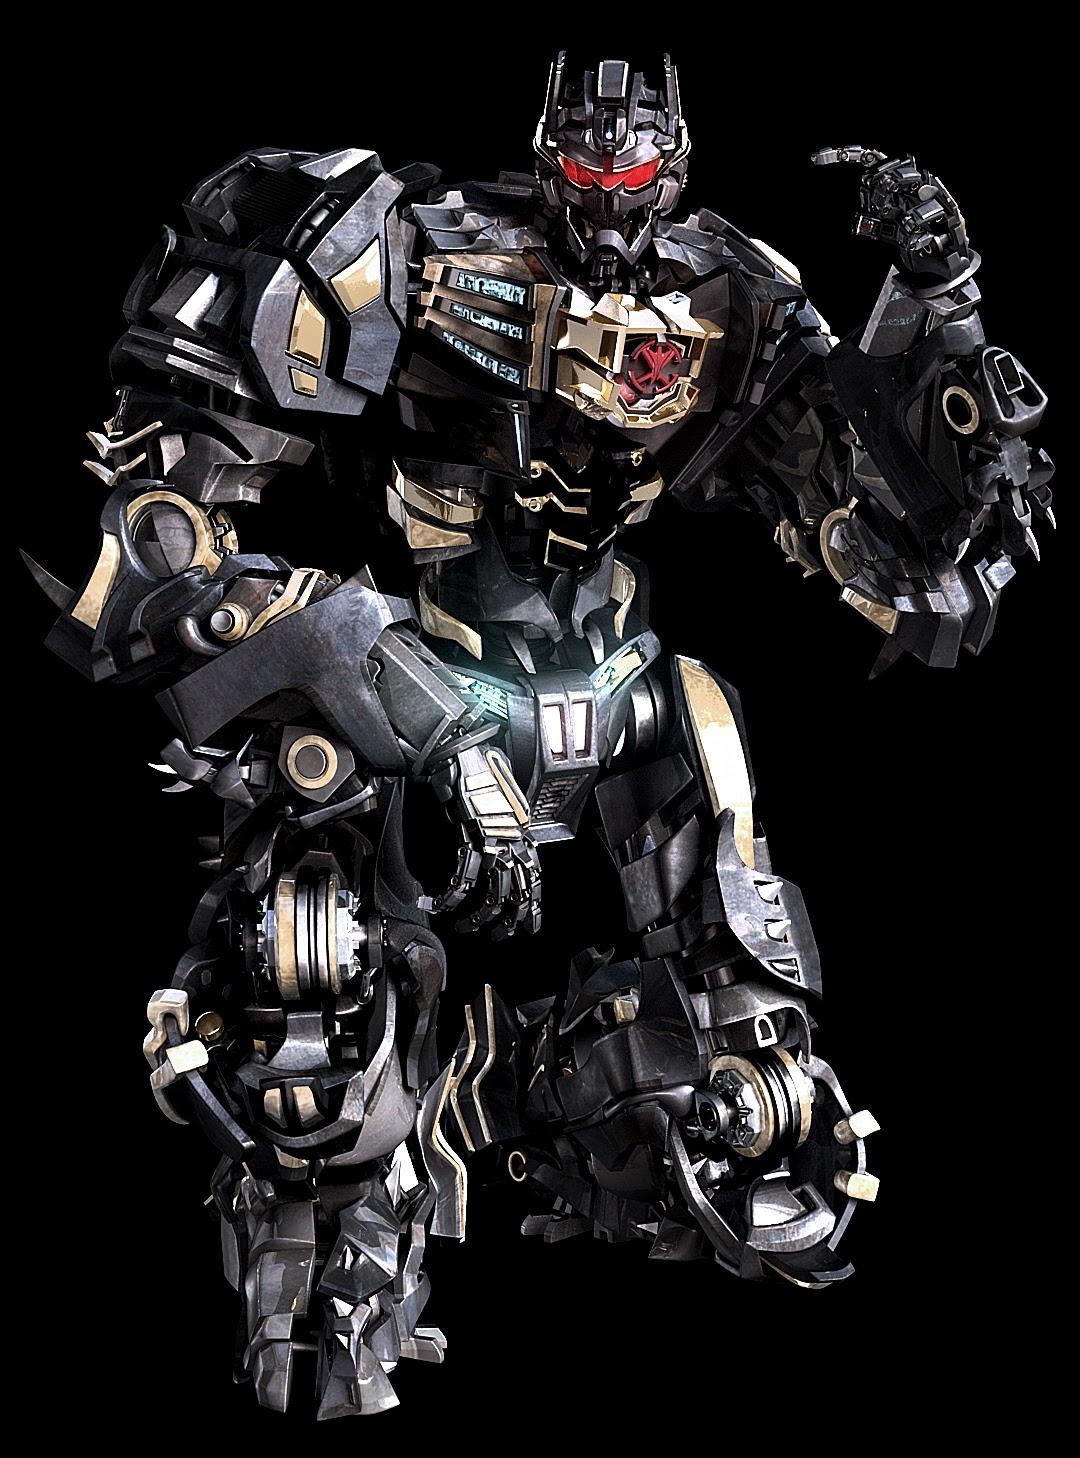 Grimlock transformers 4